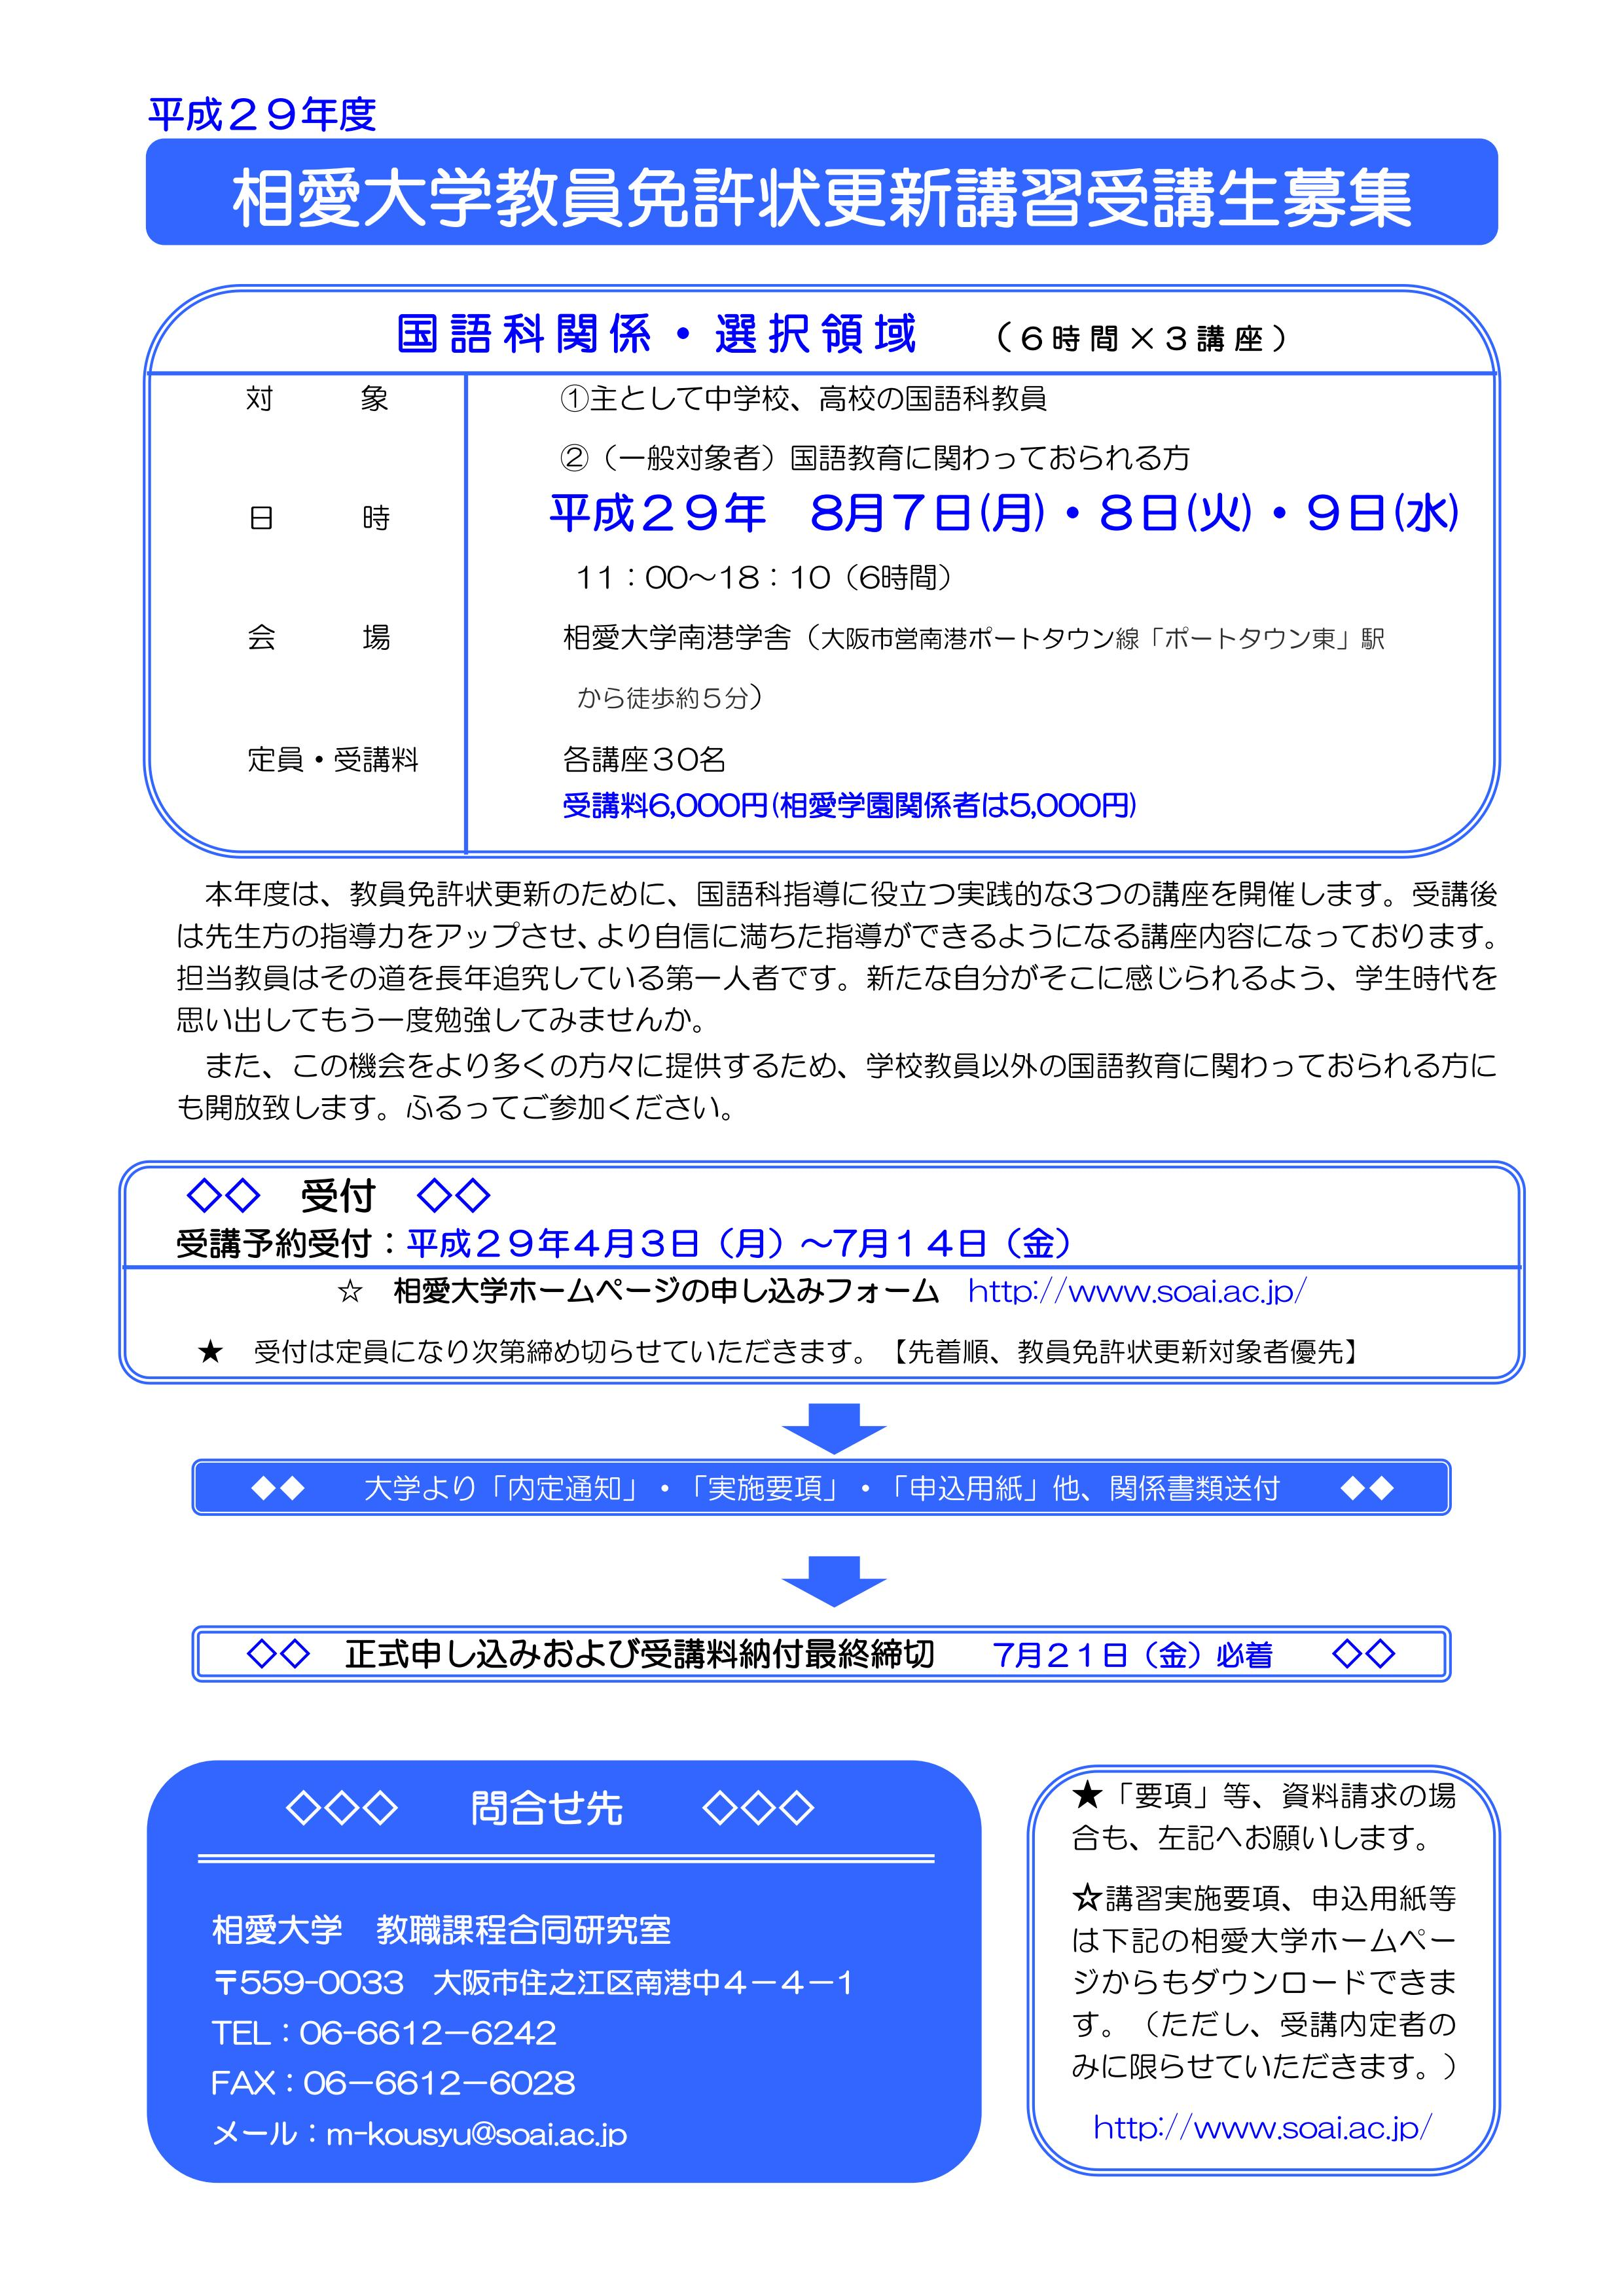 http://www.soai.ac.jp/information/lecture/kyoumen-koushu_2017_01.jpg